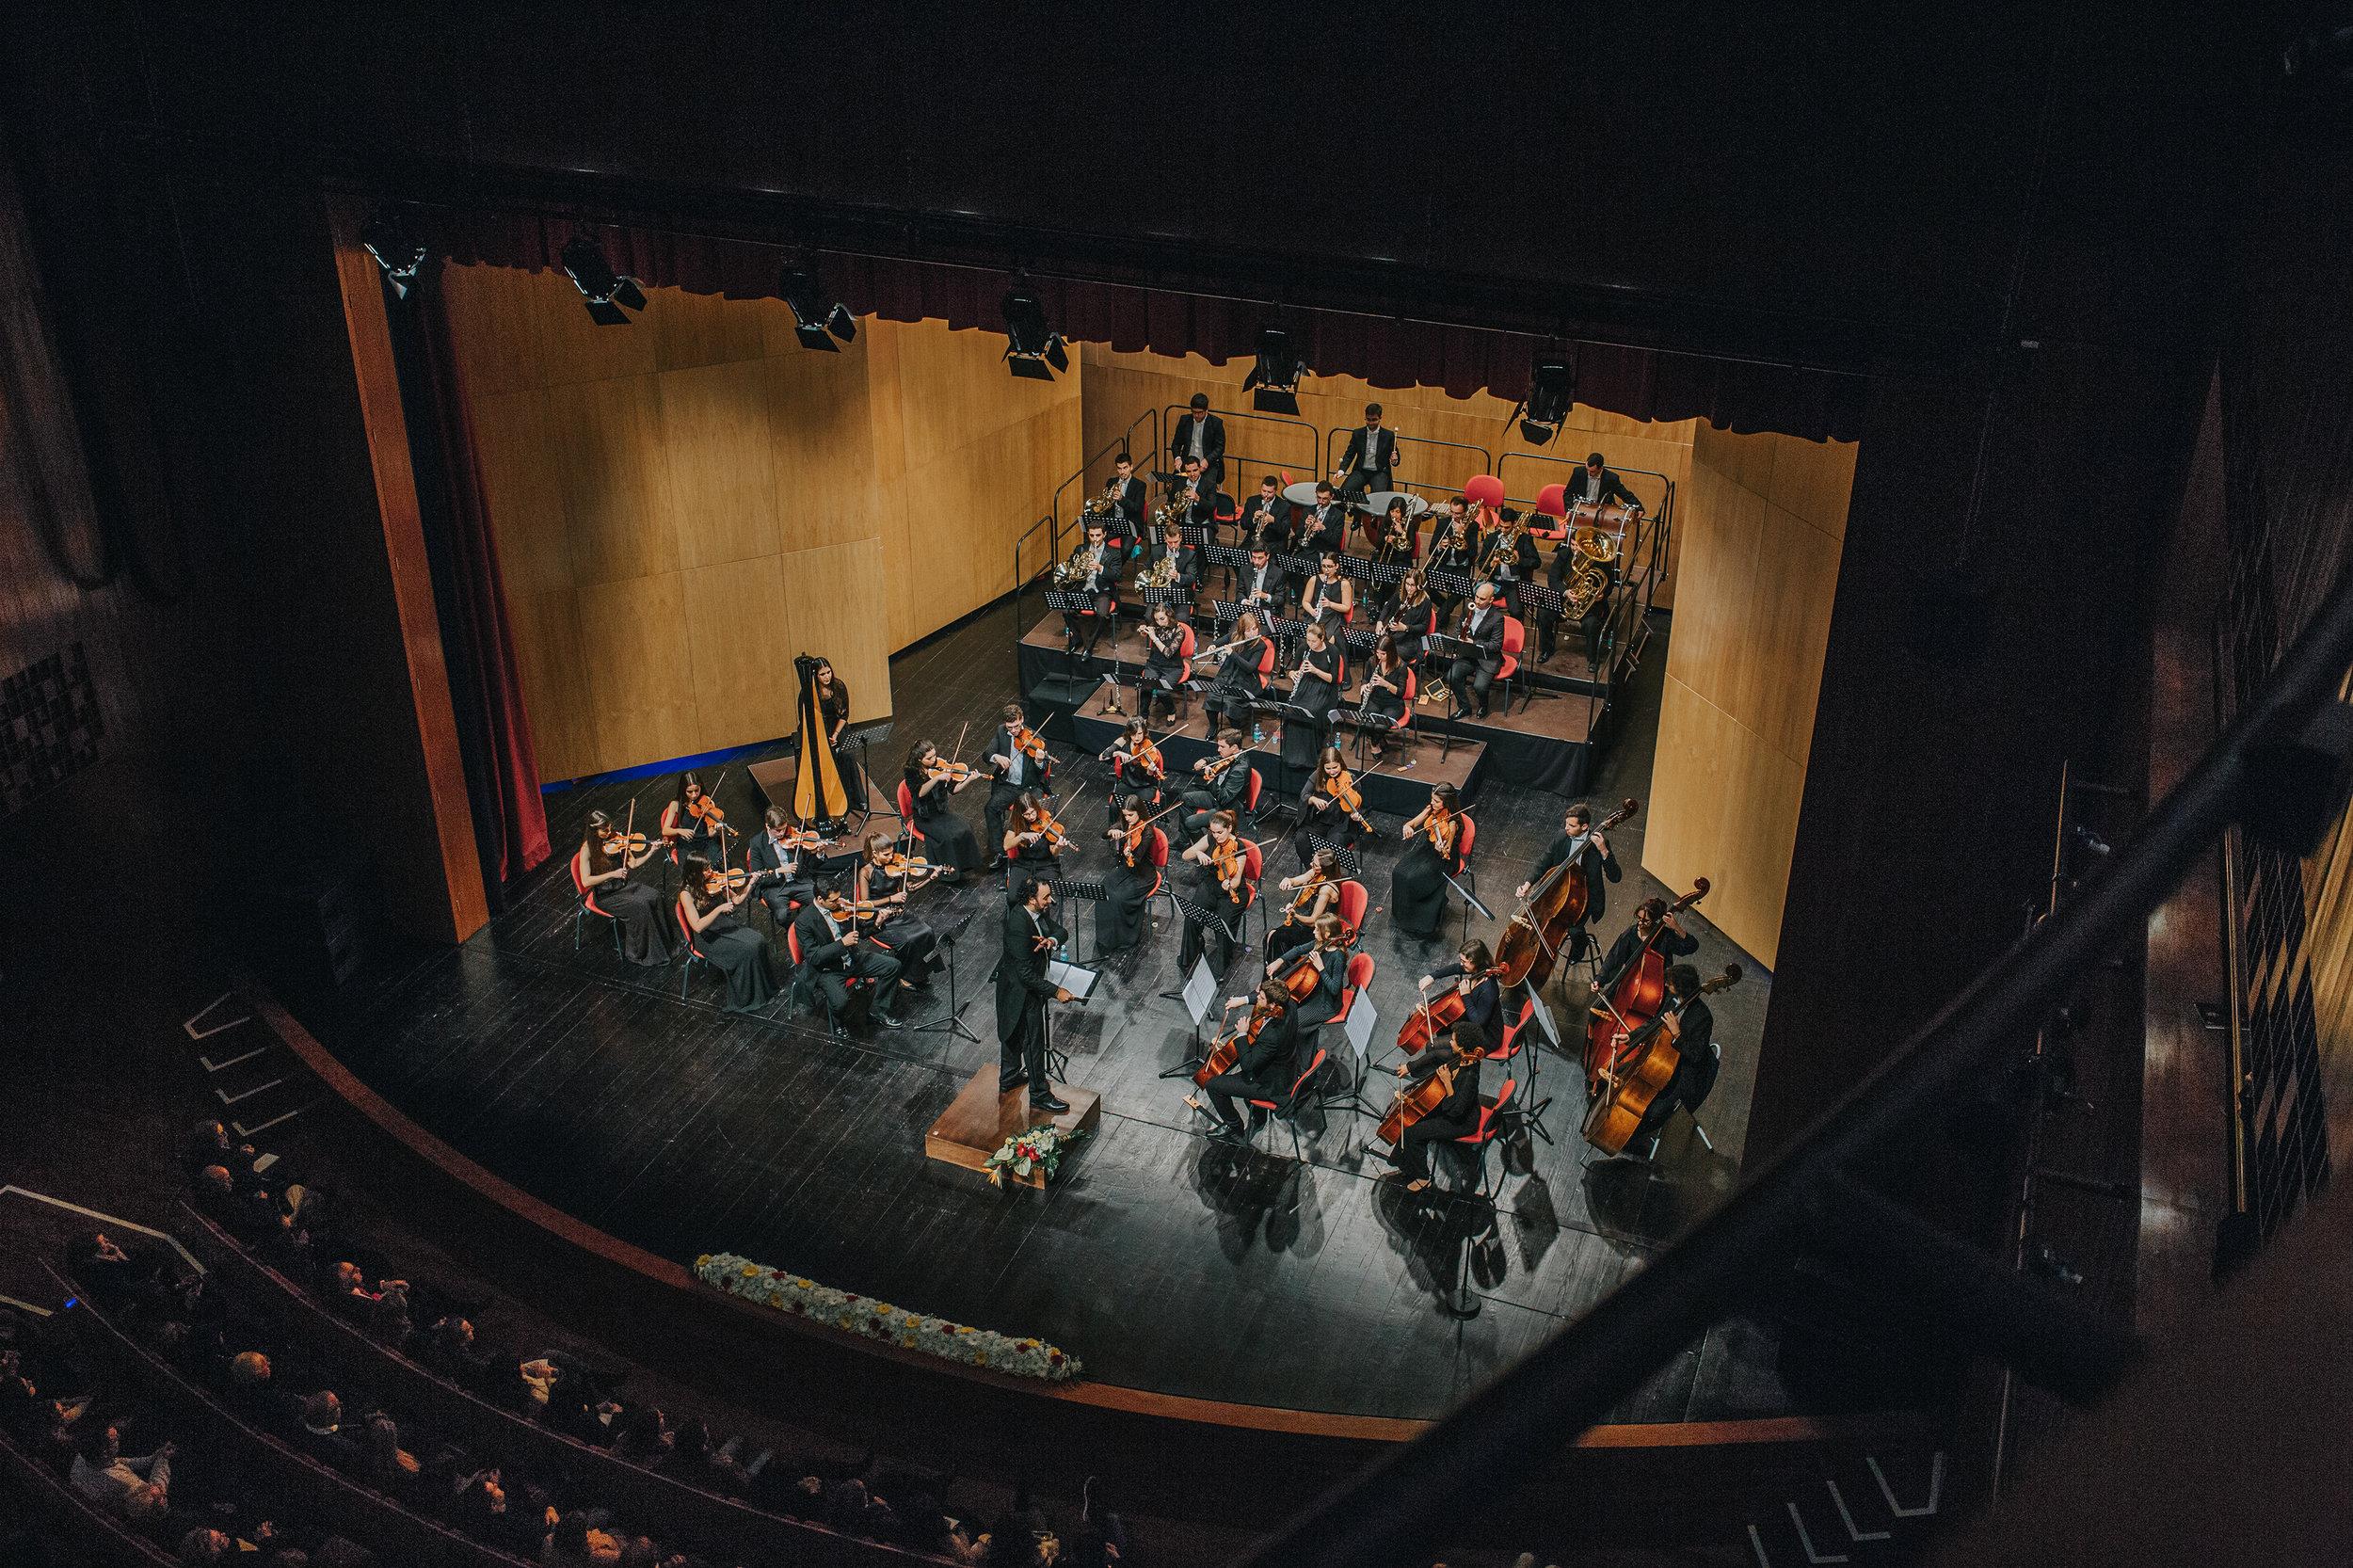 Orquestra-297.jpg